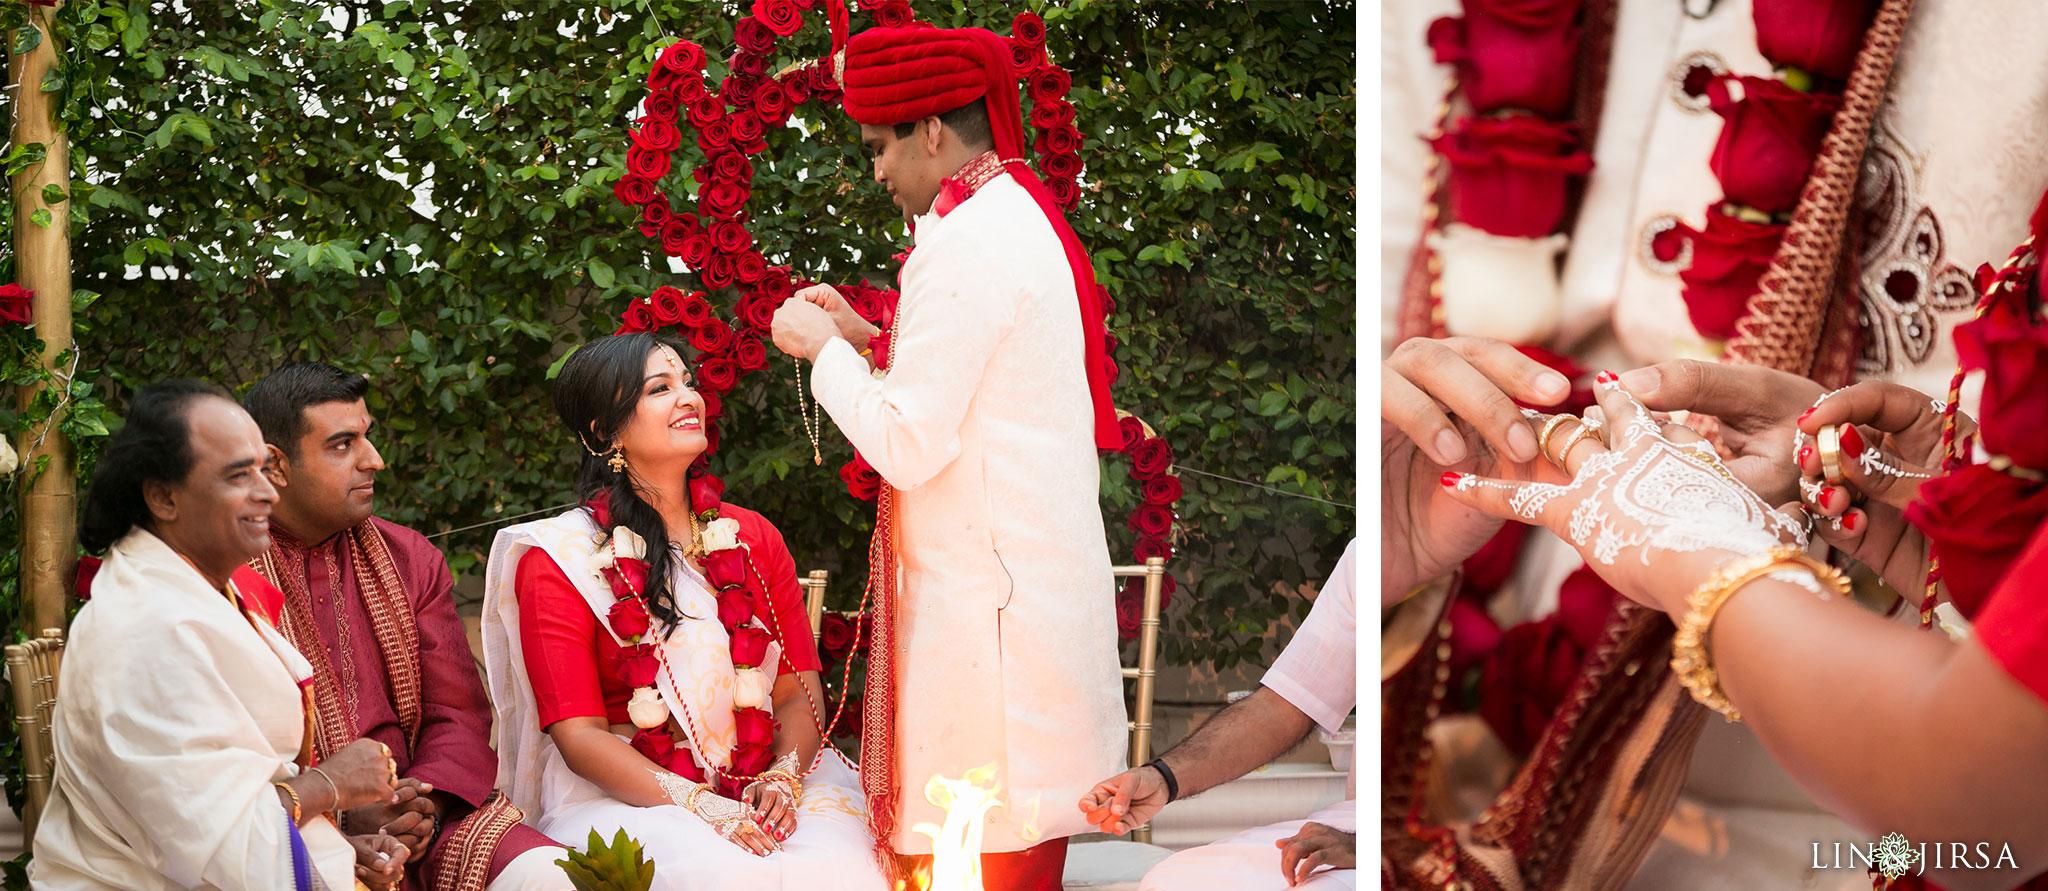 45 Orange County Indian Wedding Photography